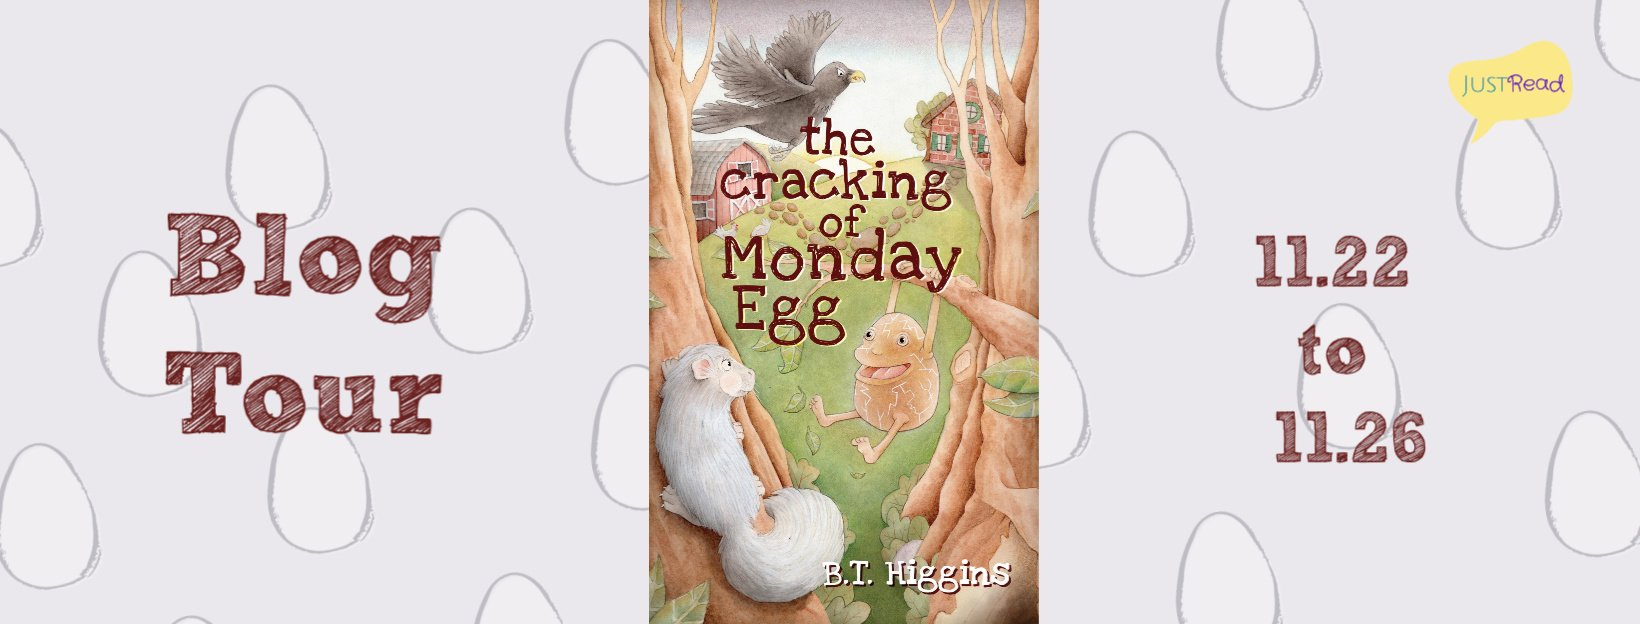 The Cracking of Monday Egg JR Blog Tour